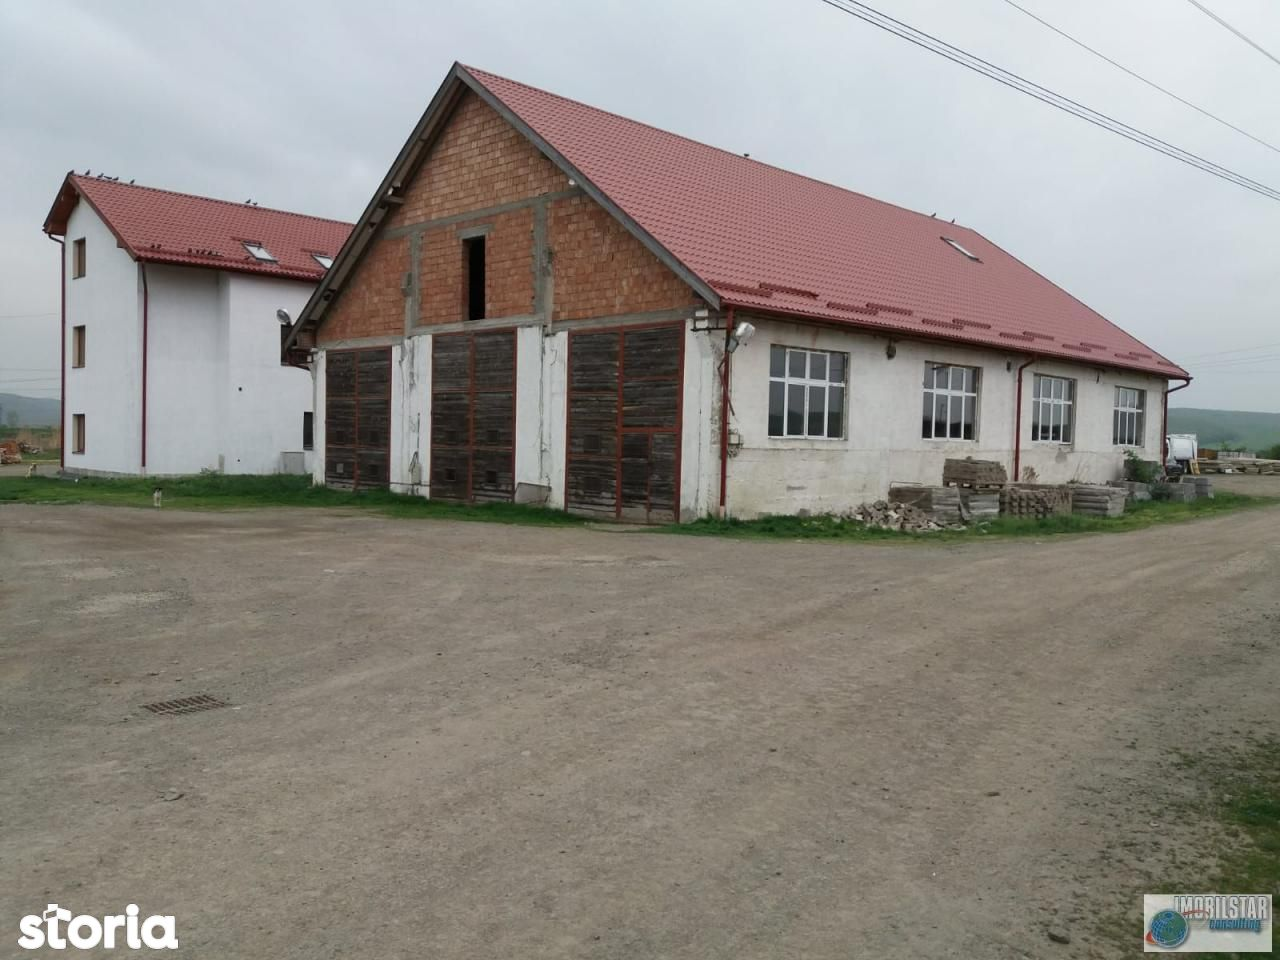 Spatiu Comercial de inchiriat, Mureș (judet), Târgu Mureş - Foto 1